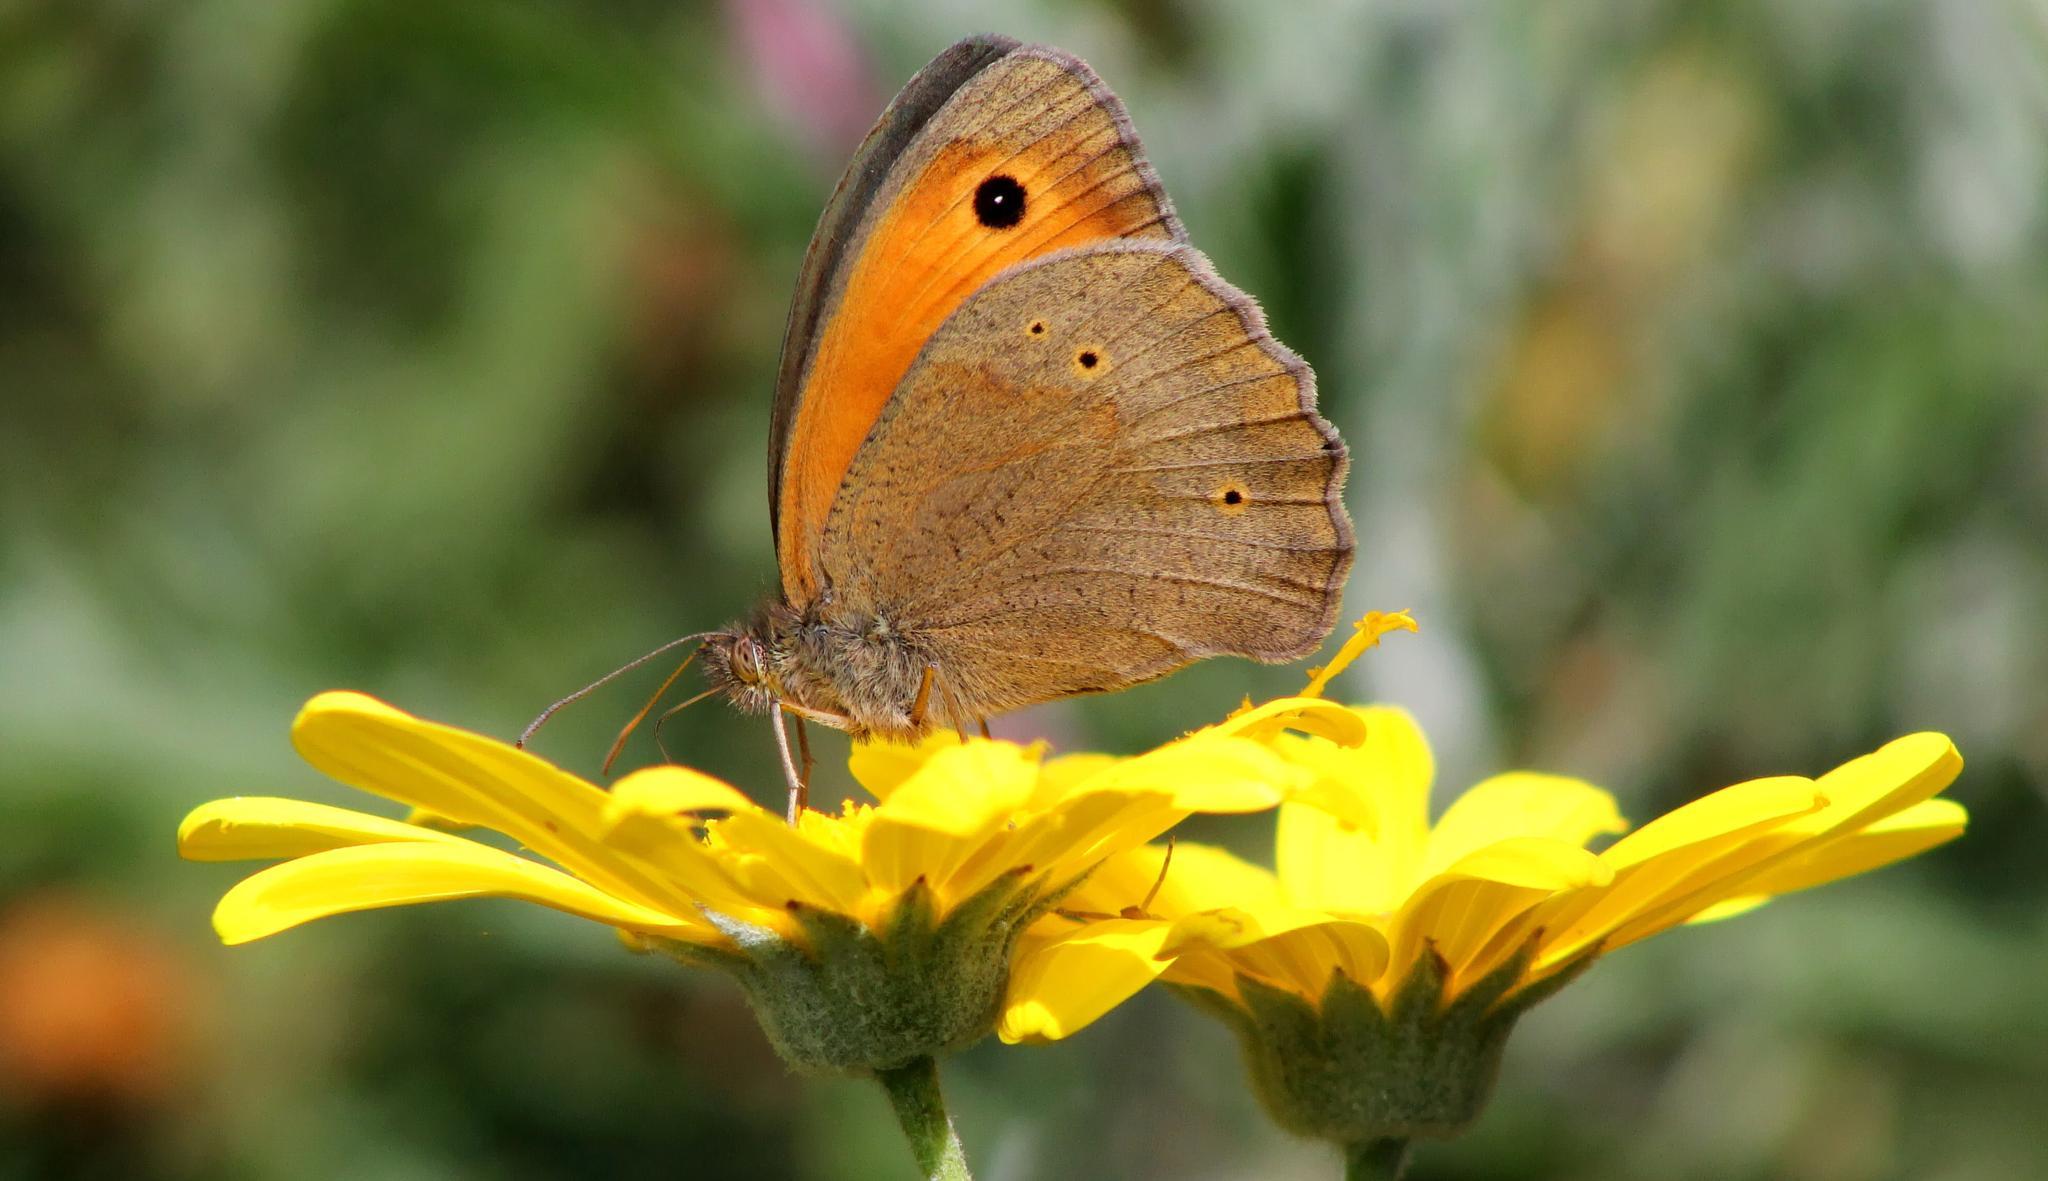 butterfly by Kristijan Siladic